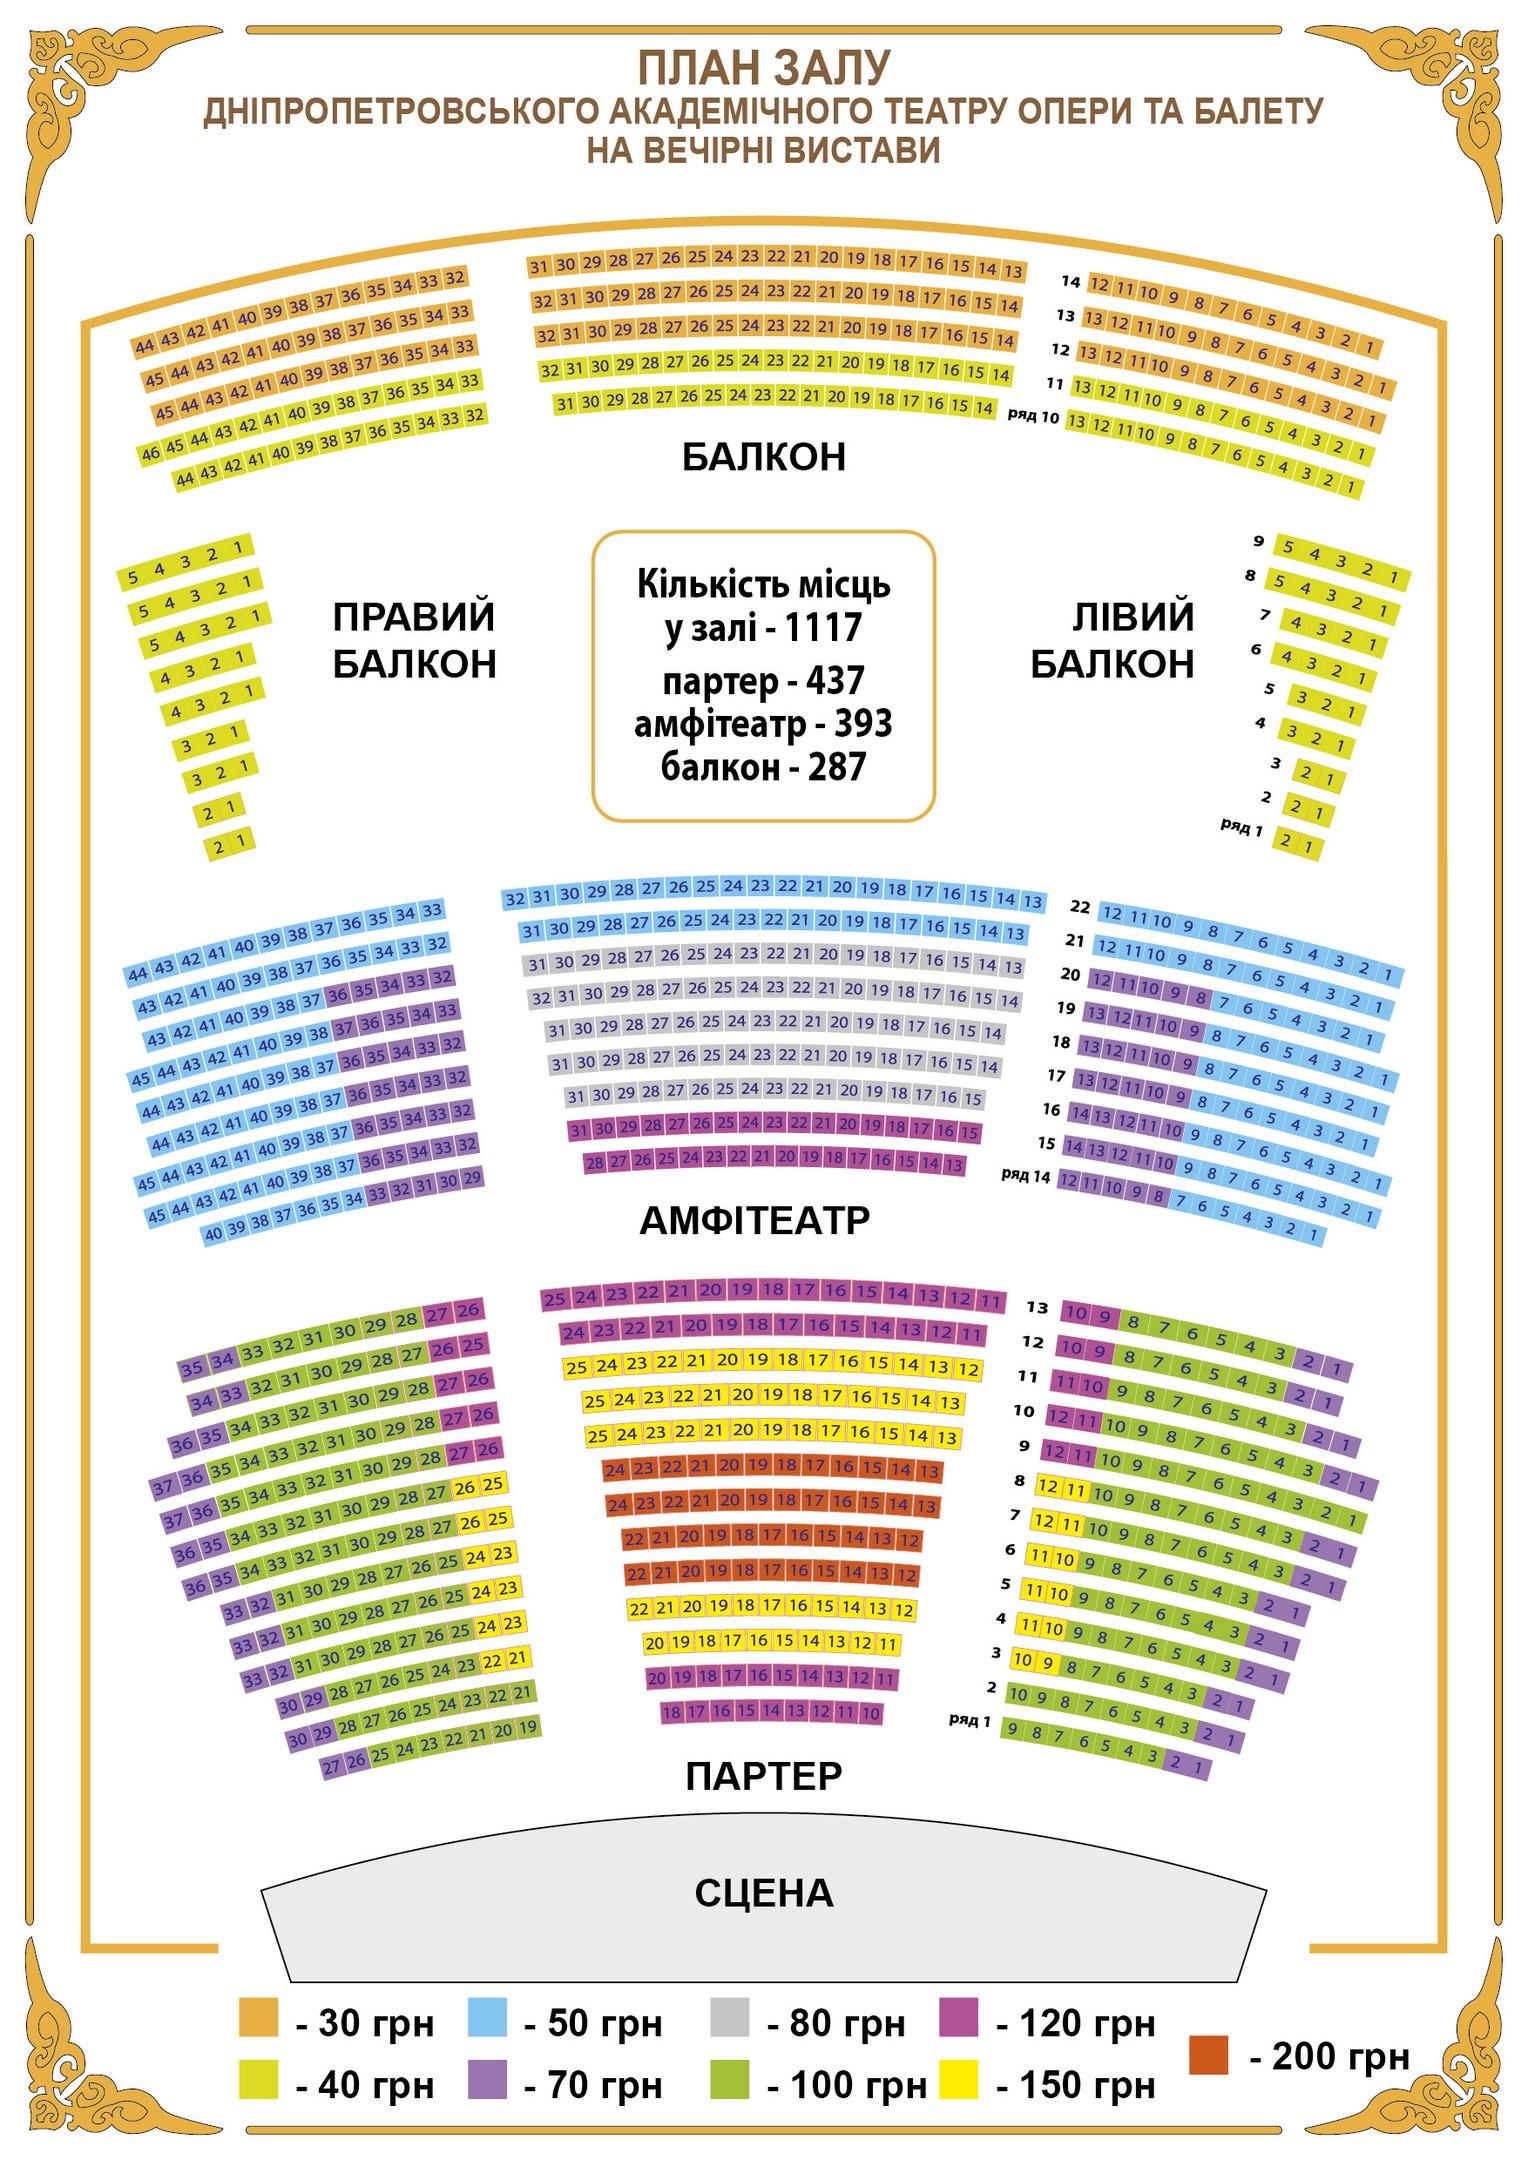 Места в театре схема театр оперы и балета